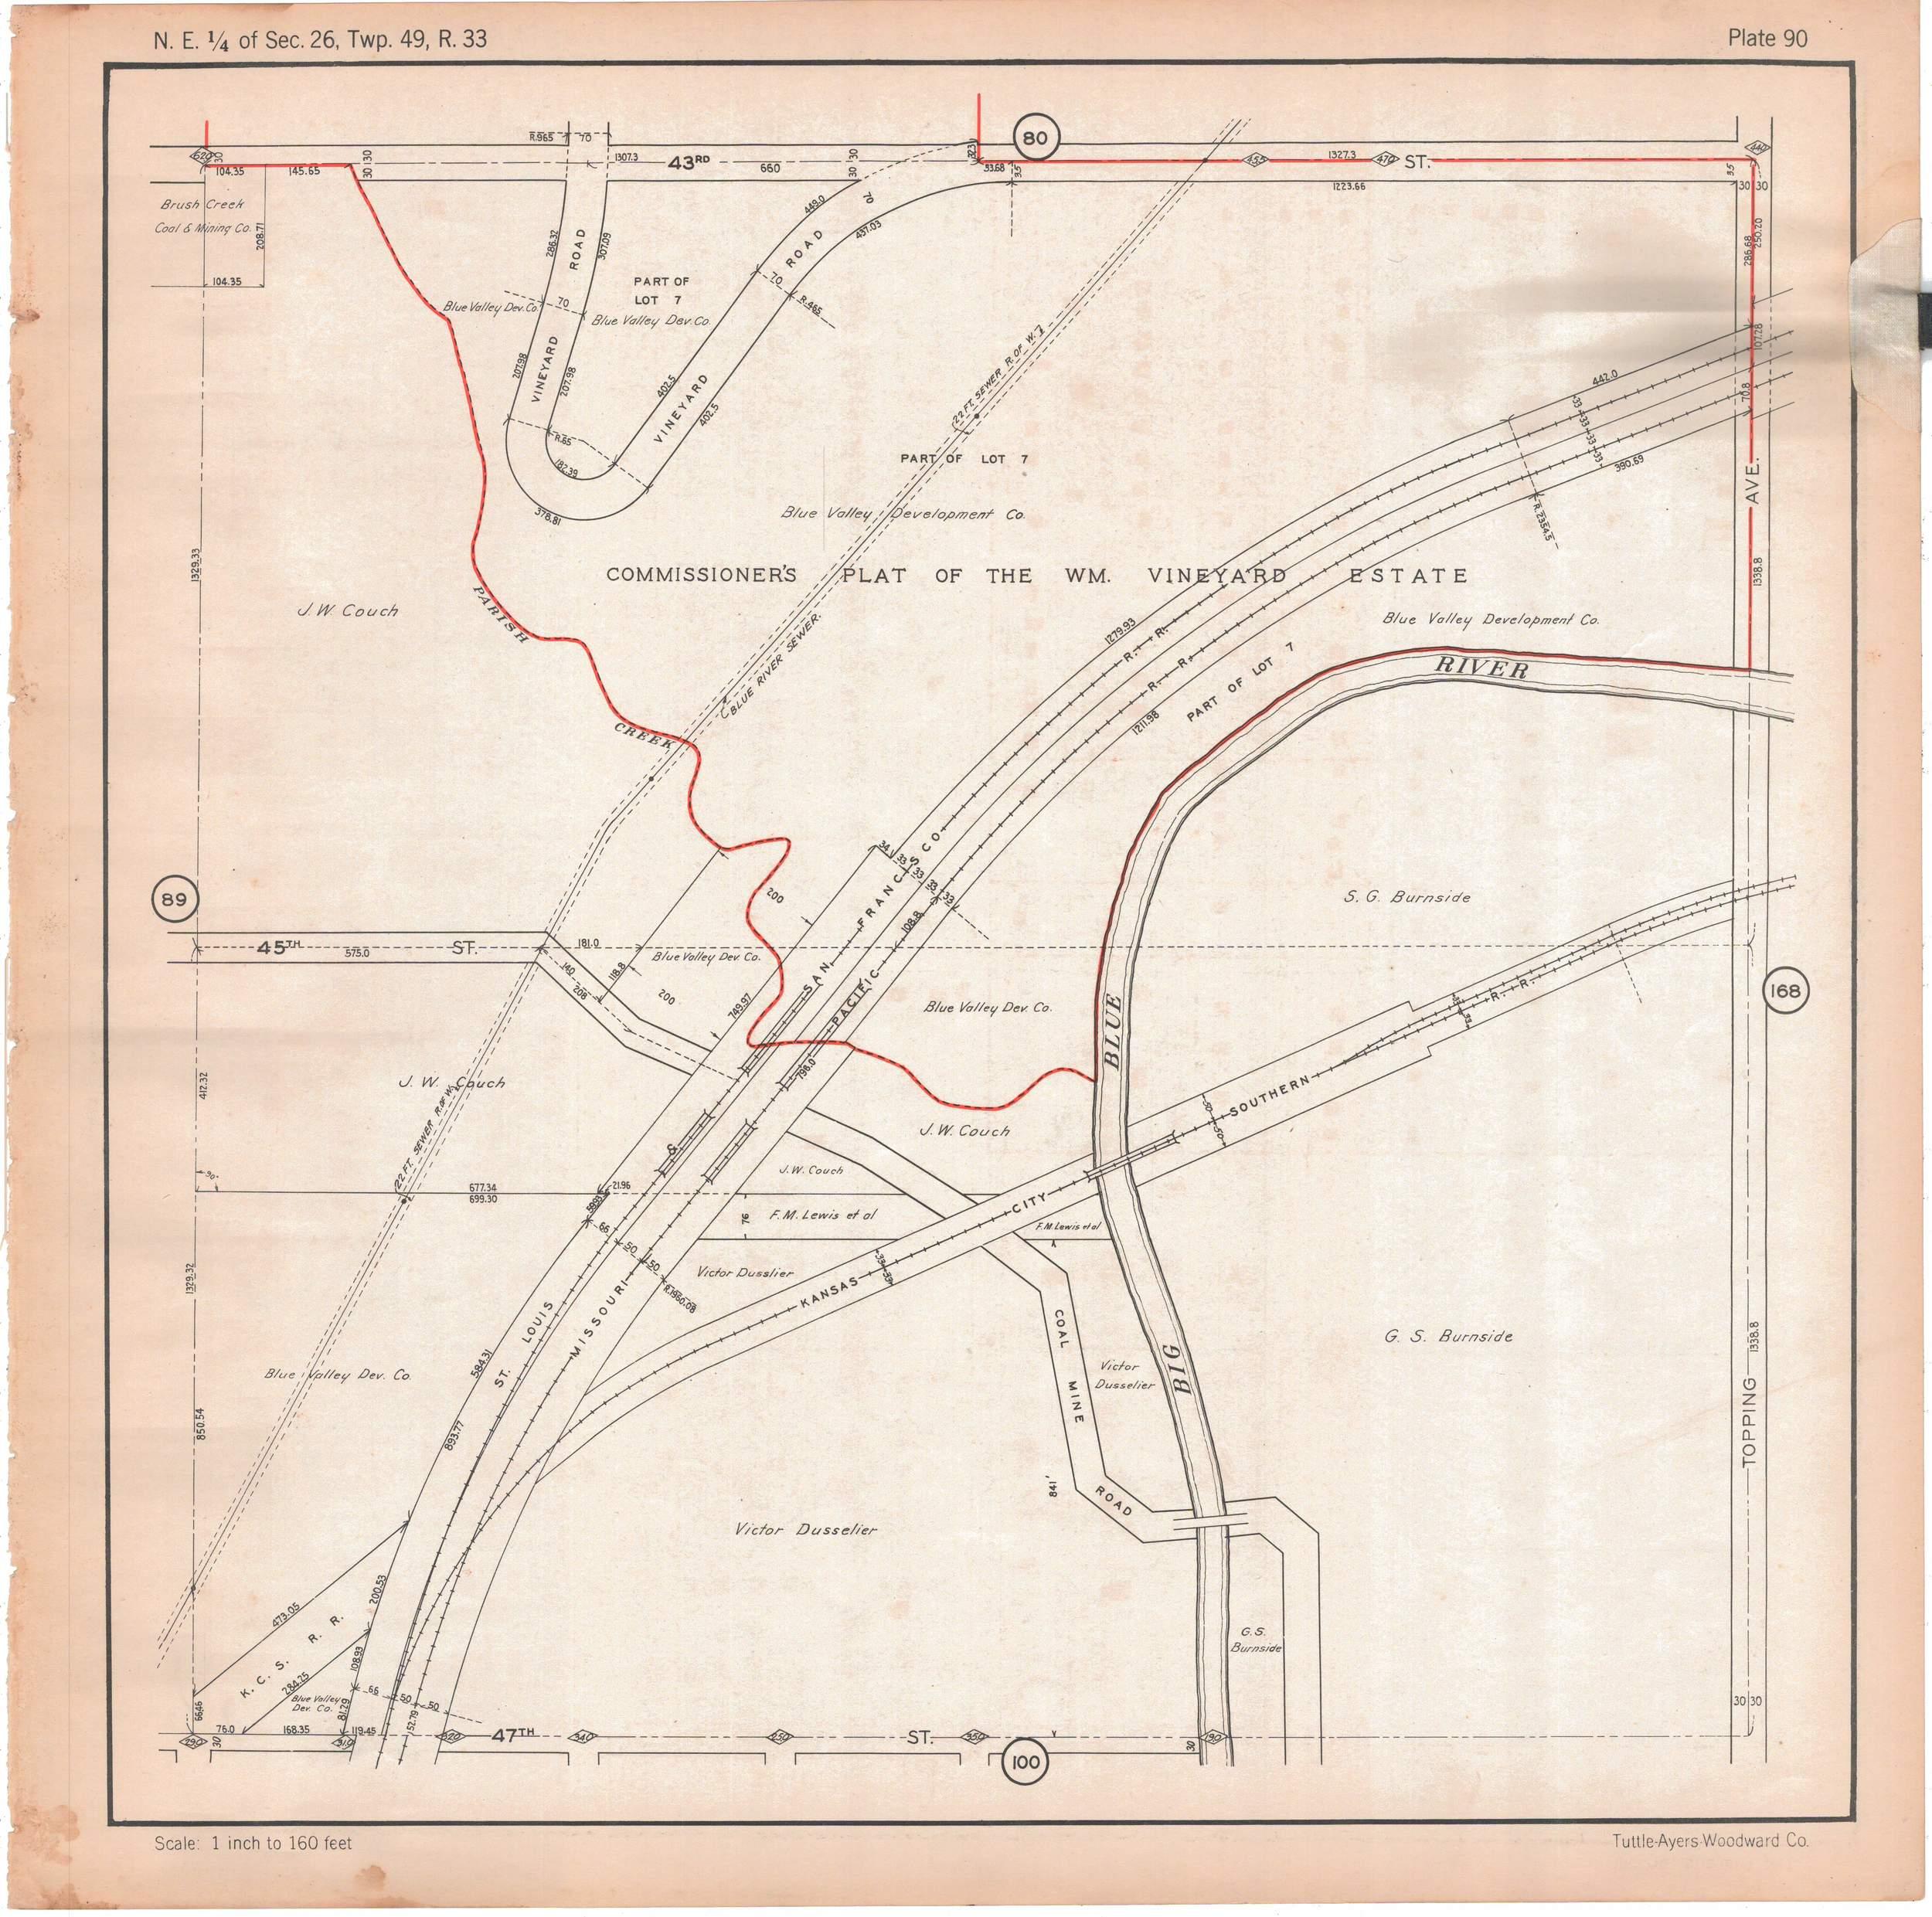 1925 TUTTLE_AYERS_Plate 90.JPG